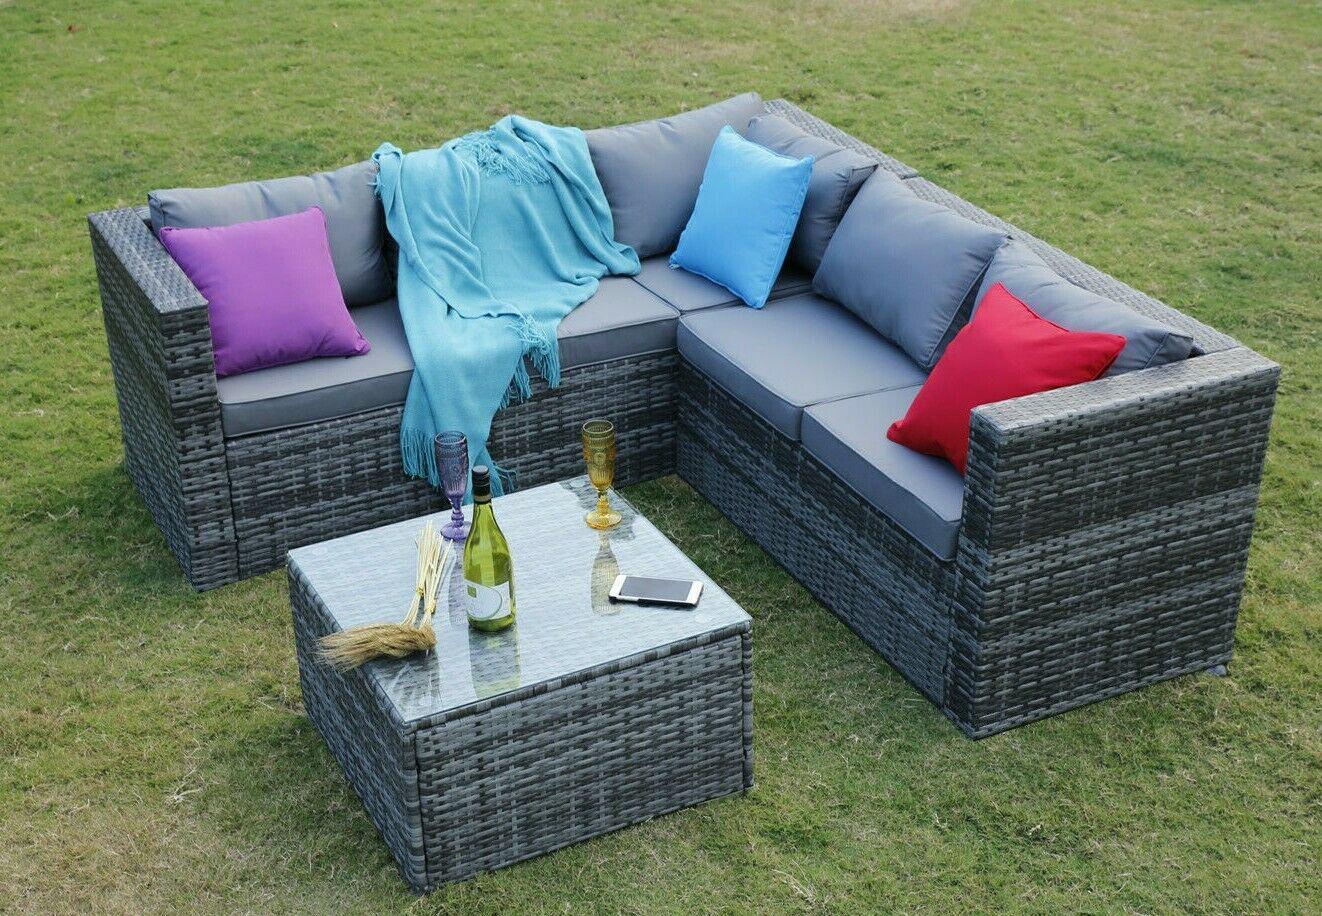 Garden Furniture - Outdoor Rattan Garden Furniture 5 Seater Corner Sofa Patio Set with Cover Option